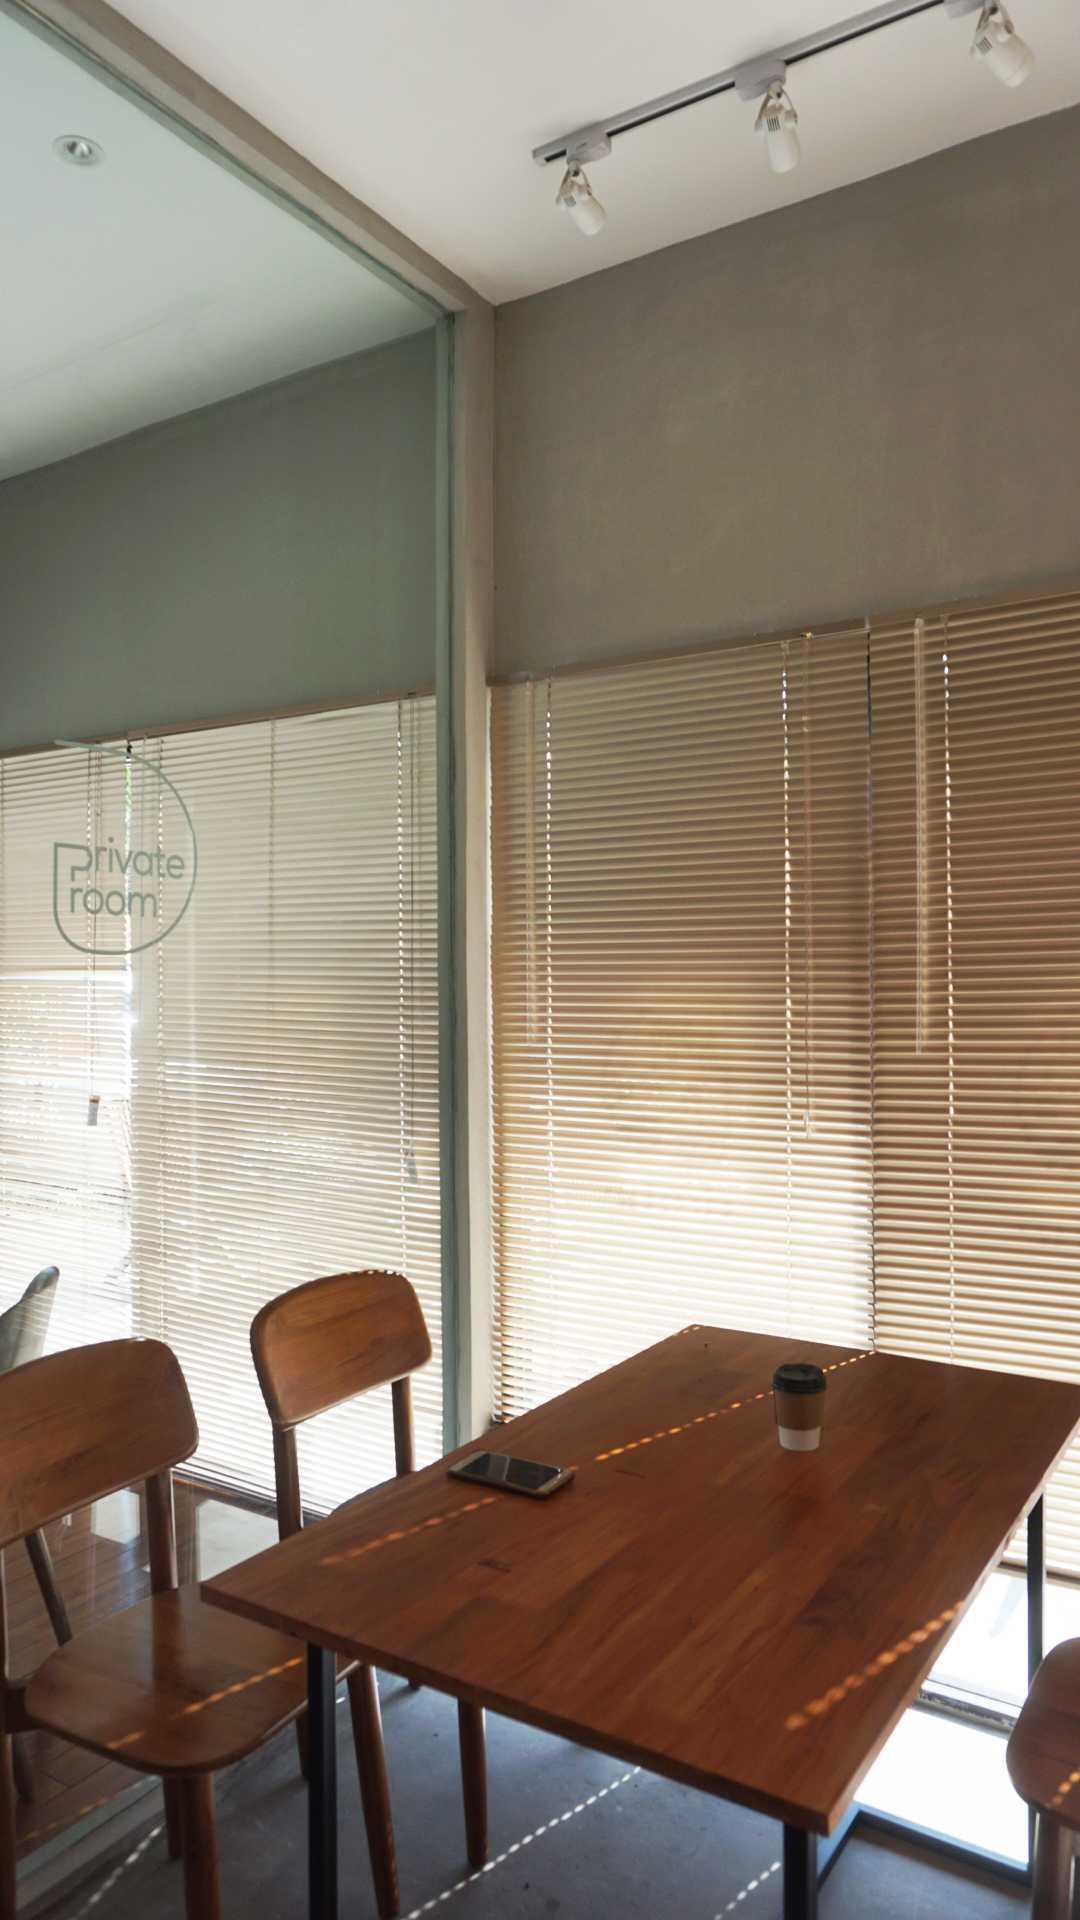 Sekala Darbe Cafe & Office, Surabaya Surabaya, Kota Sby, Jawa Timur, Indonesia Surabaya, Kota Sby, Jawa Timur, Indonesia Sekala-Drabe-Cafe-Office  97787